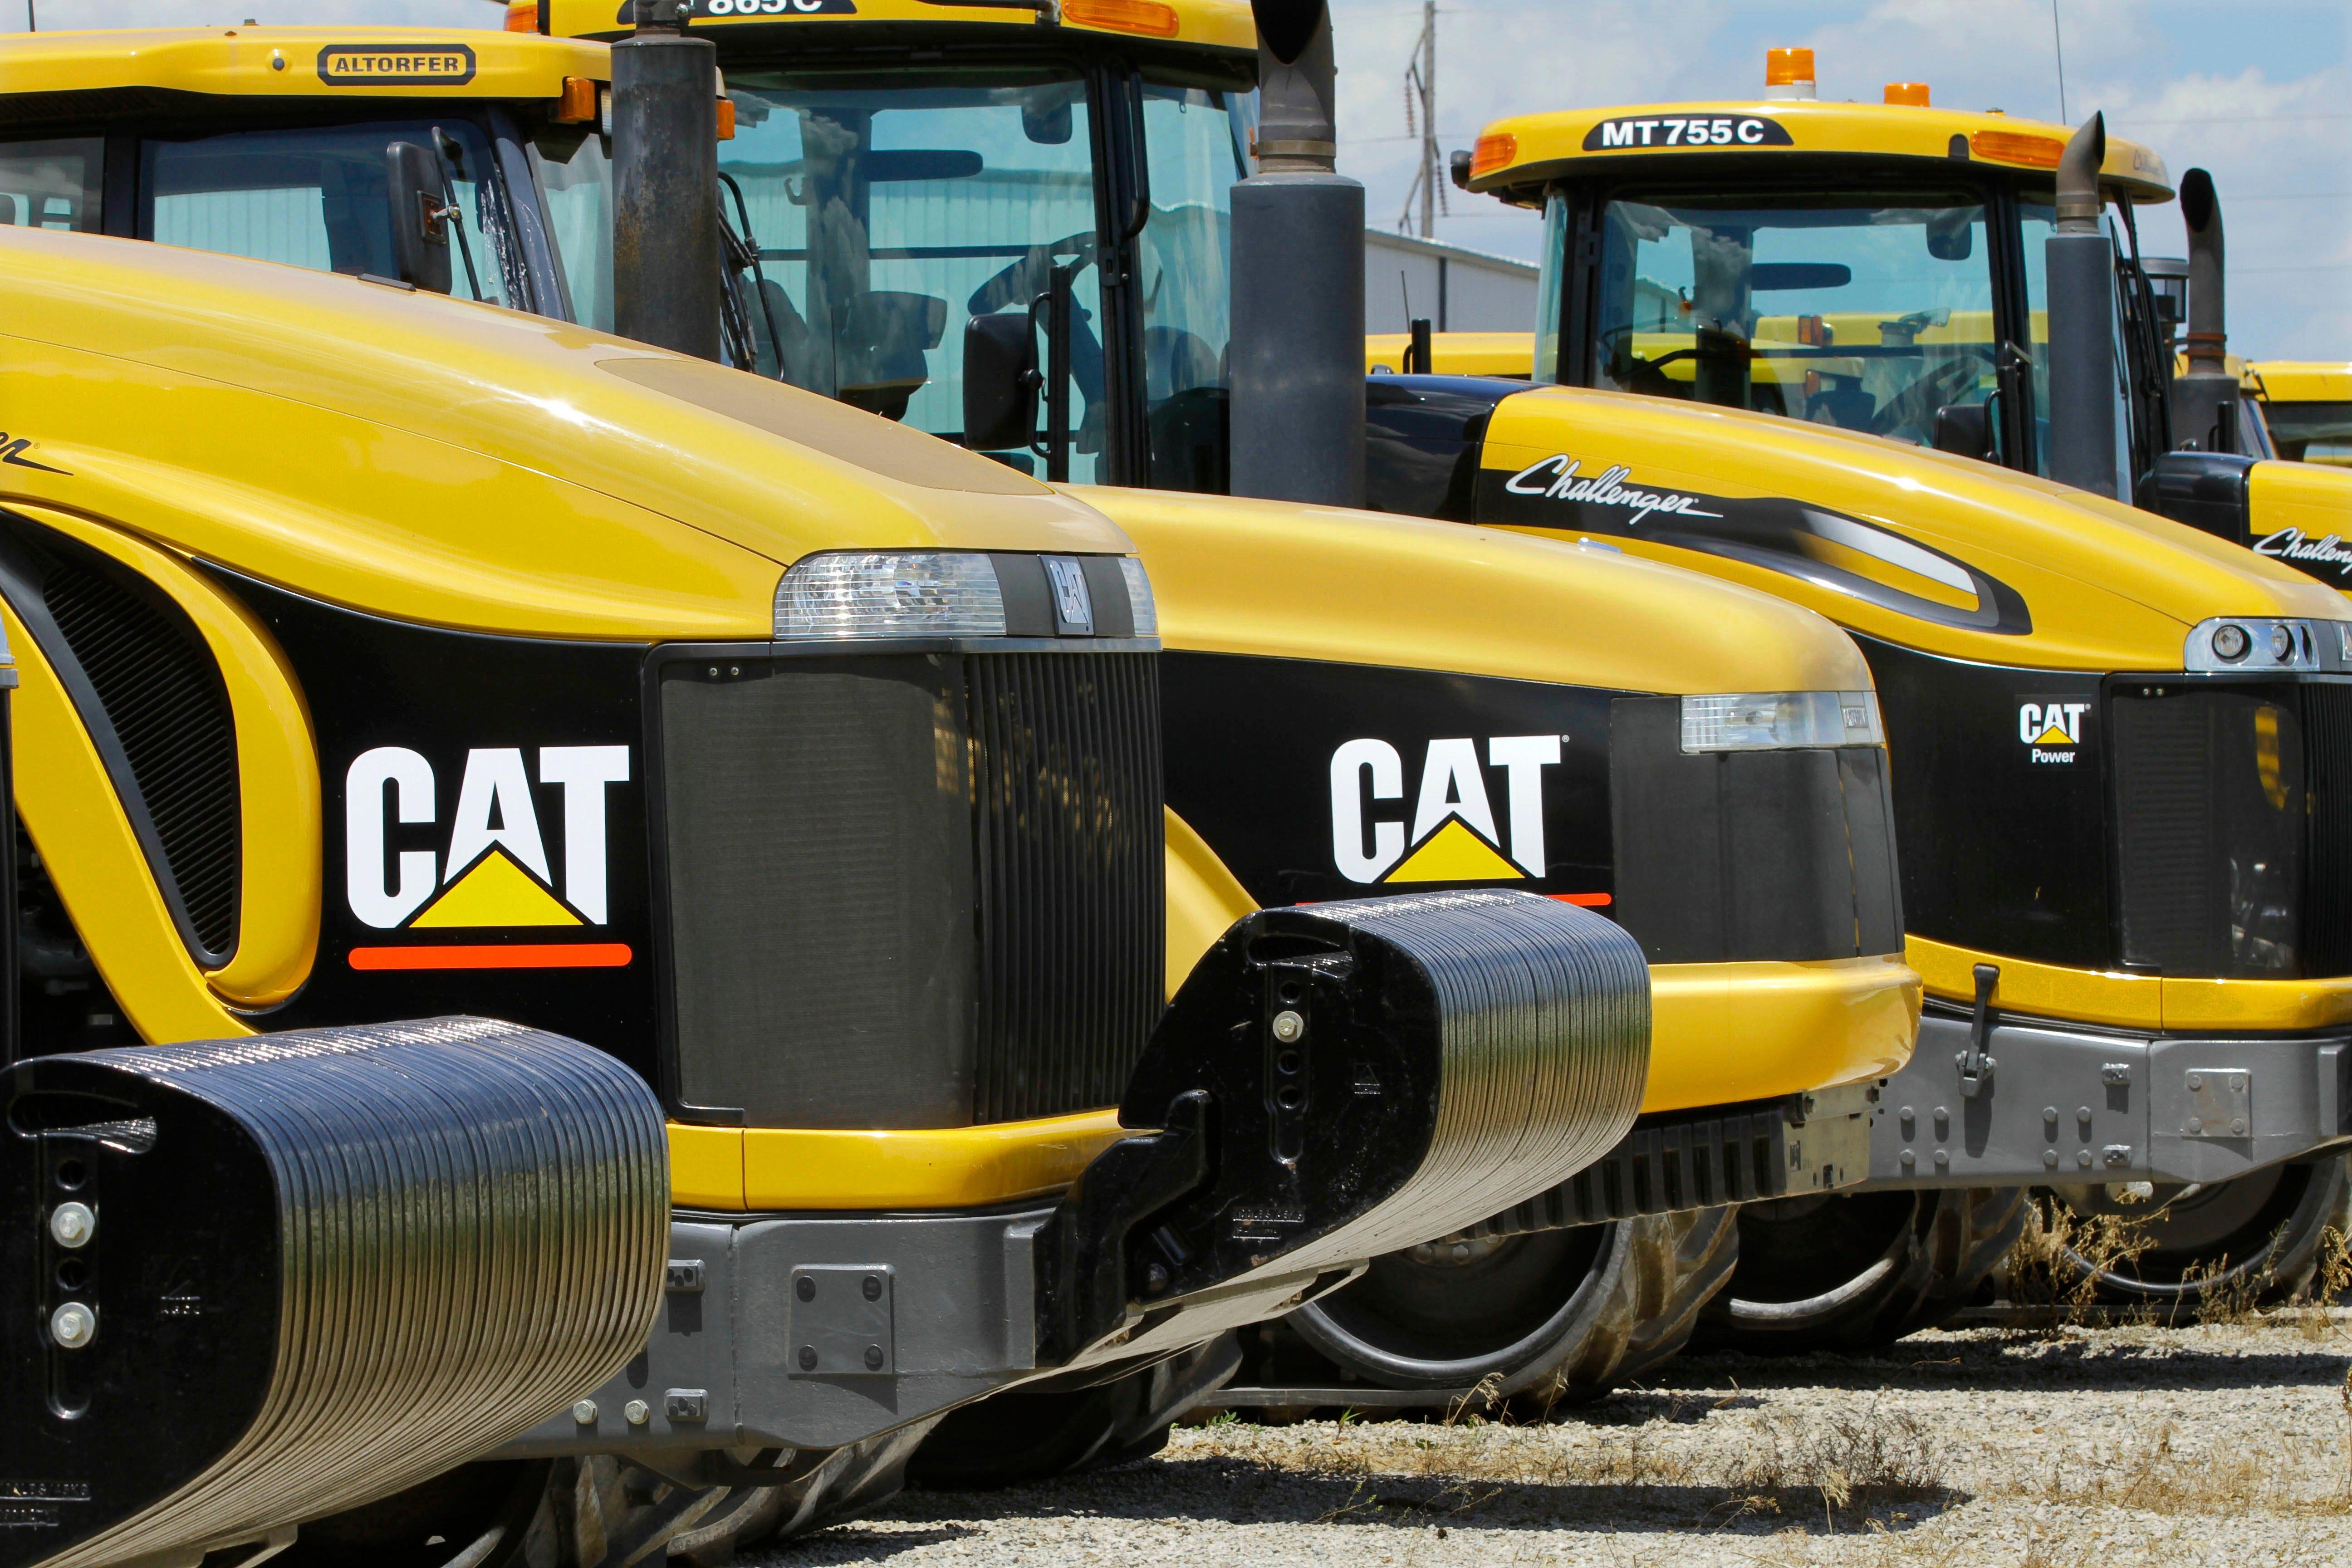 Caterpillar warns of steel tariff impact but reports upbeat earnings